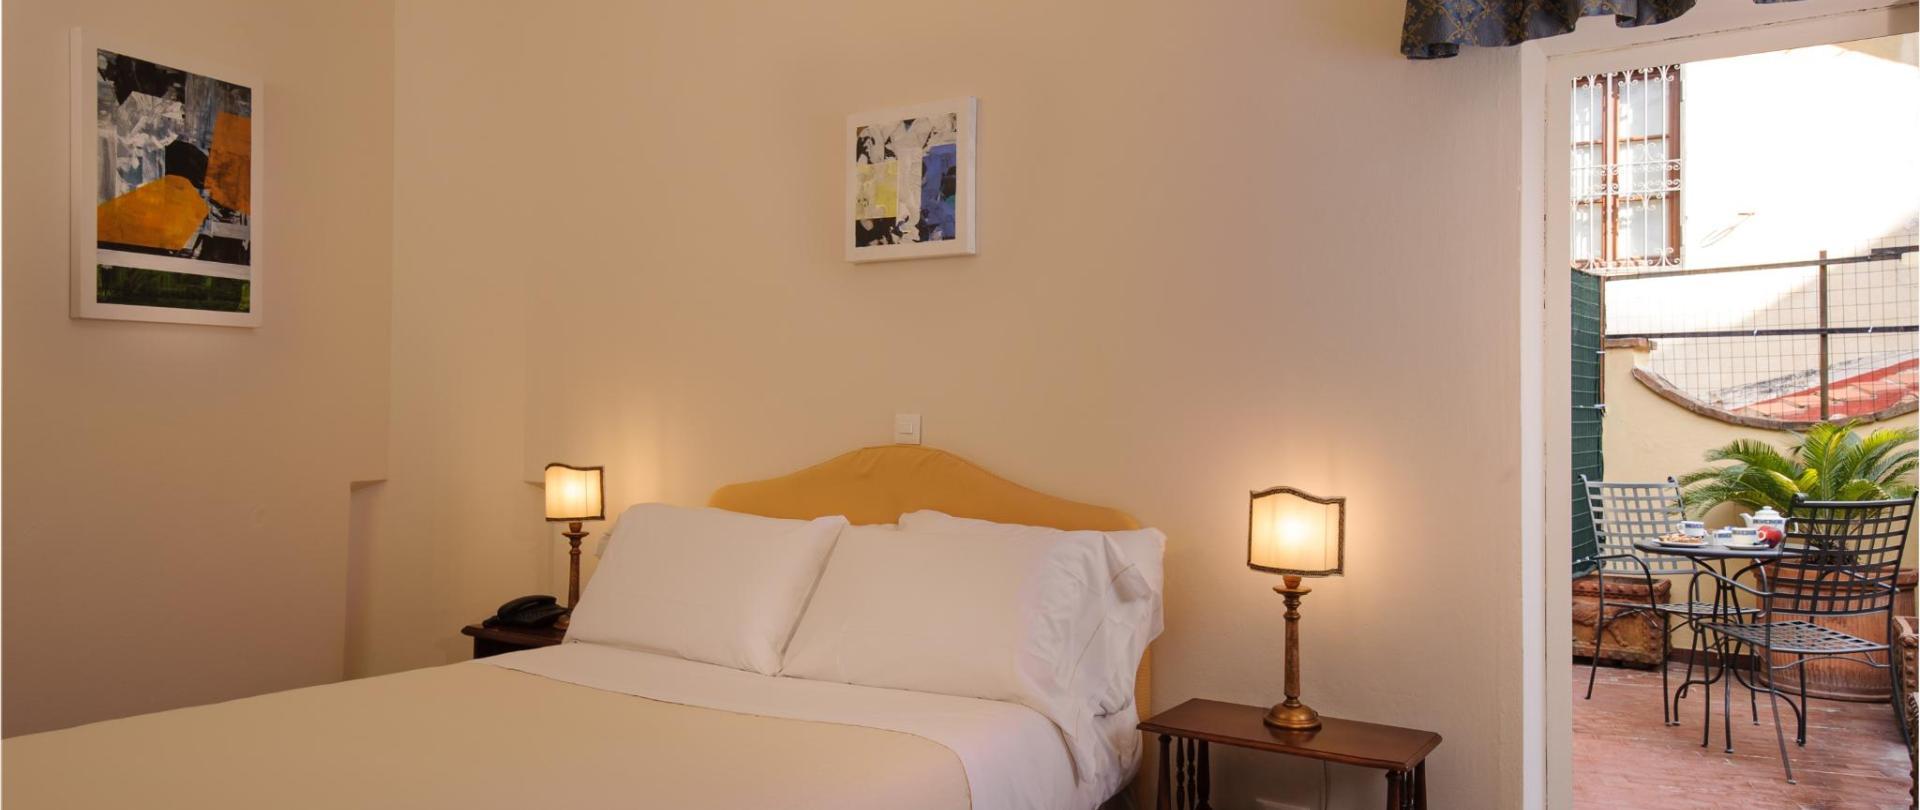 hotelannalena-21.jpg